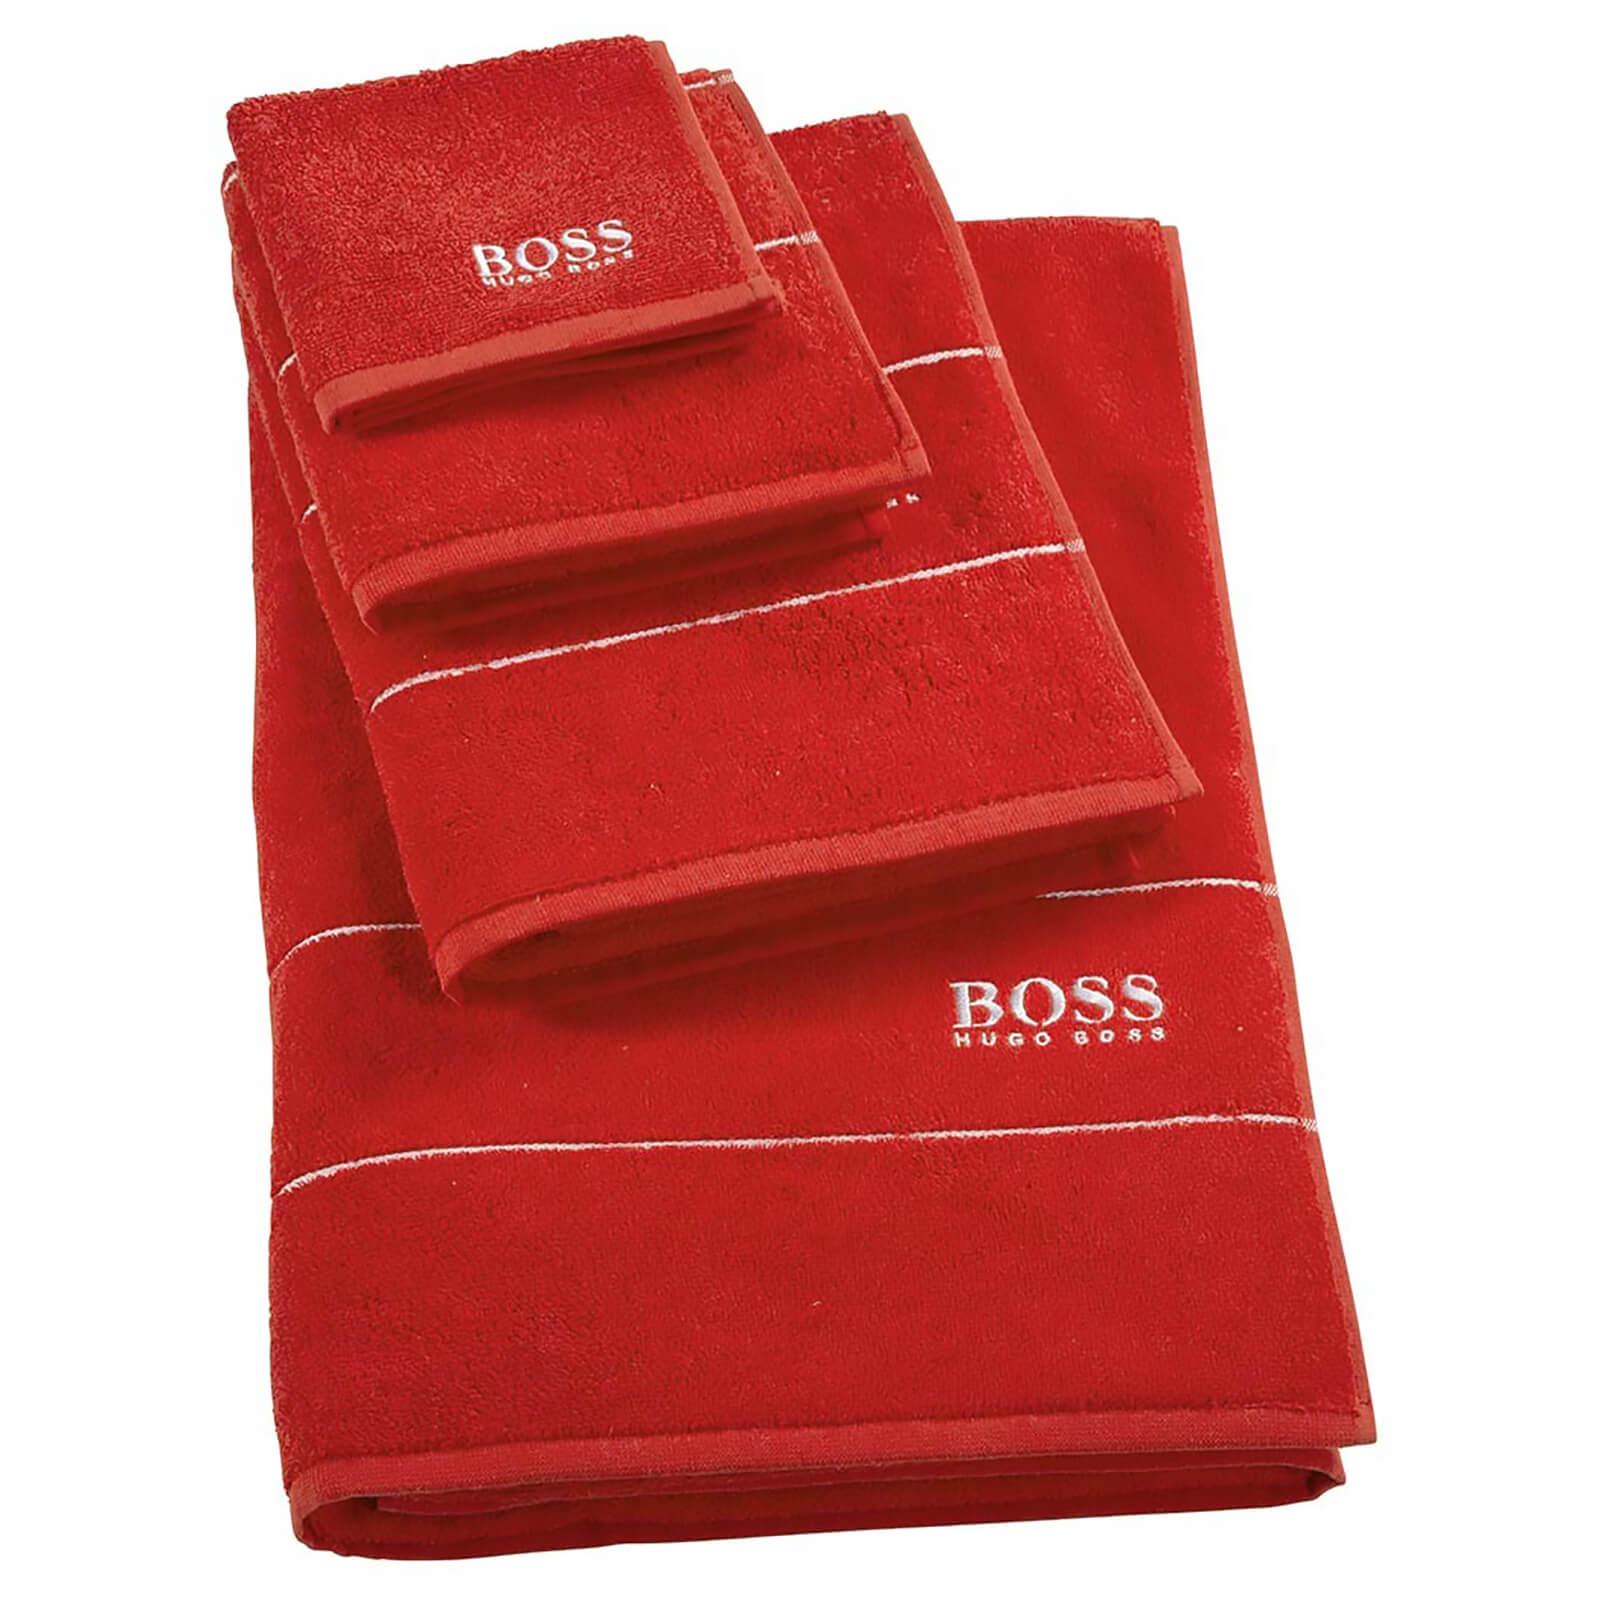 Hugo Boss Plain Towel Range - Poppy - Face Cloth - Red